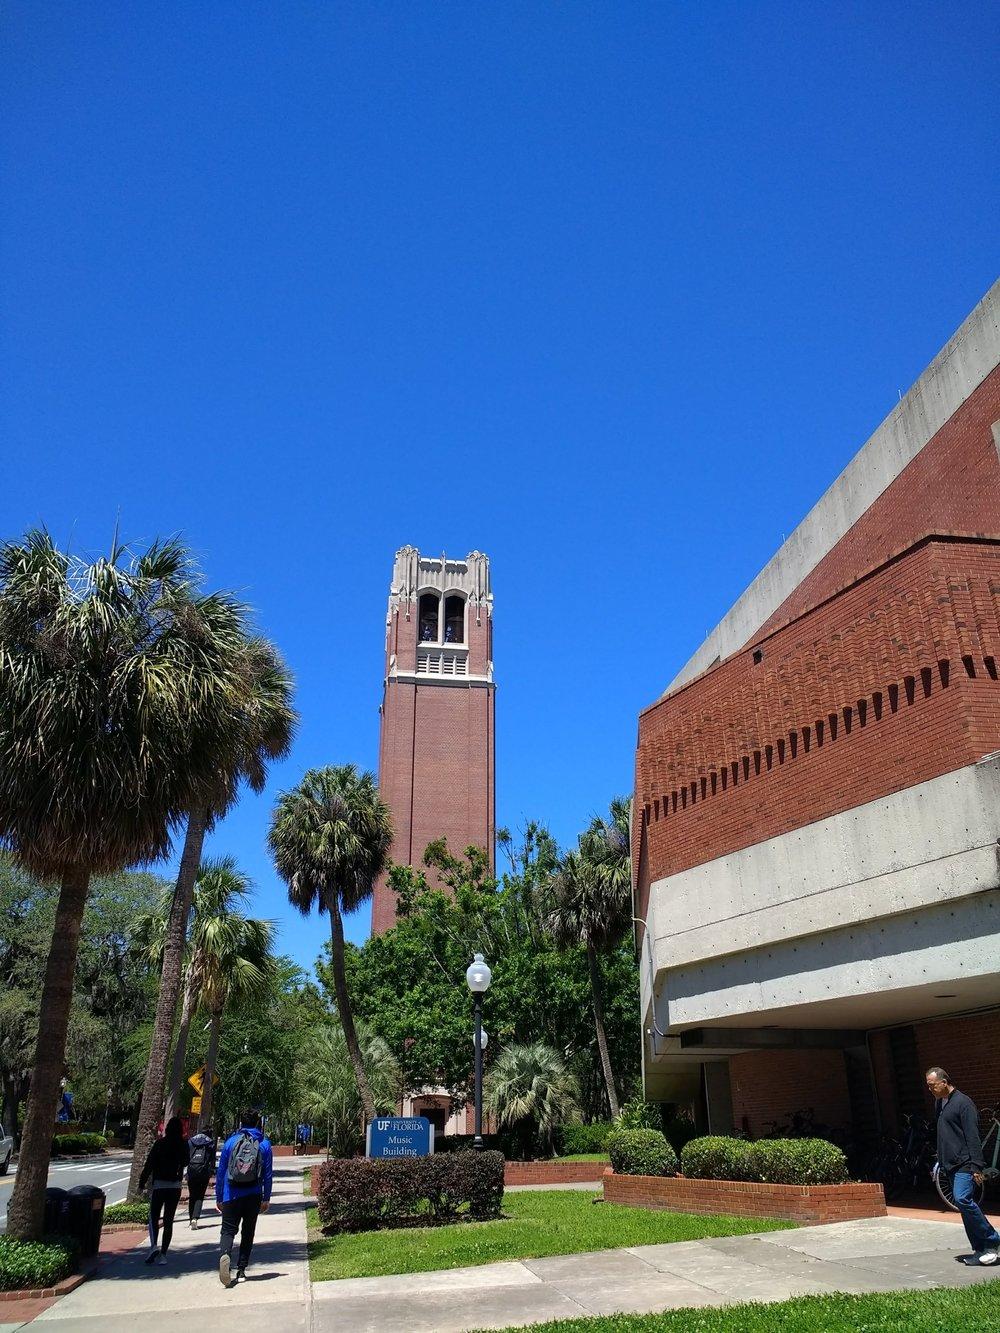 UF School of Music and Century Tower